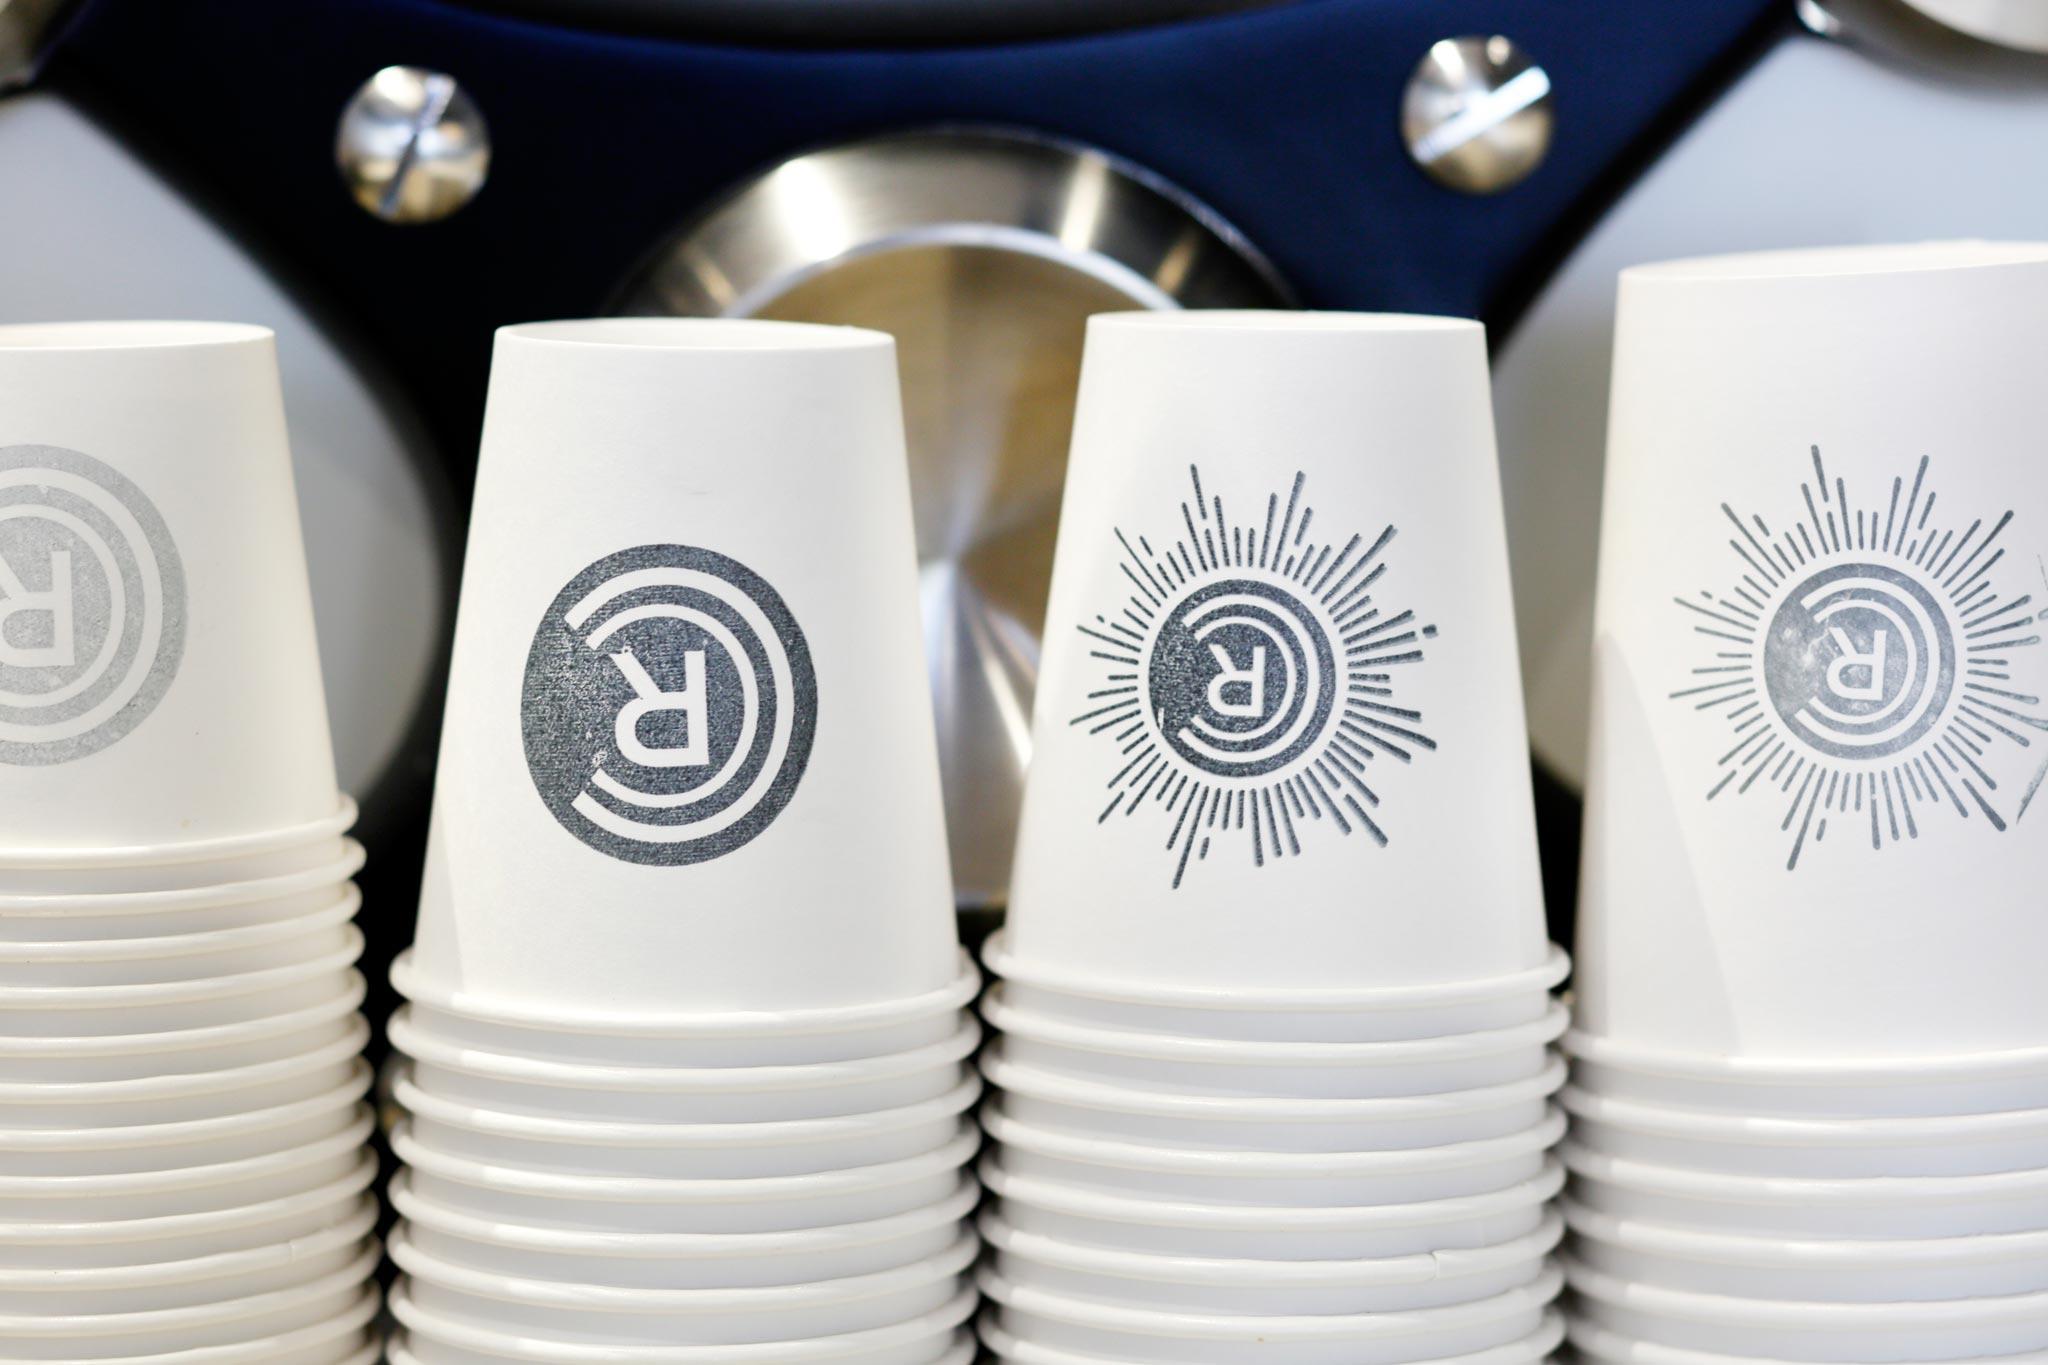 Revelator Birmingham modern coffee shop close up of coffee cups